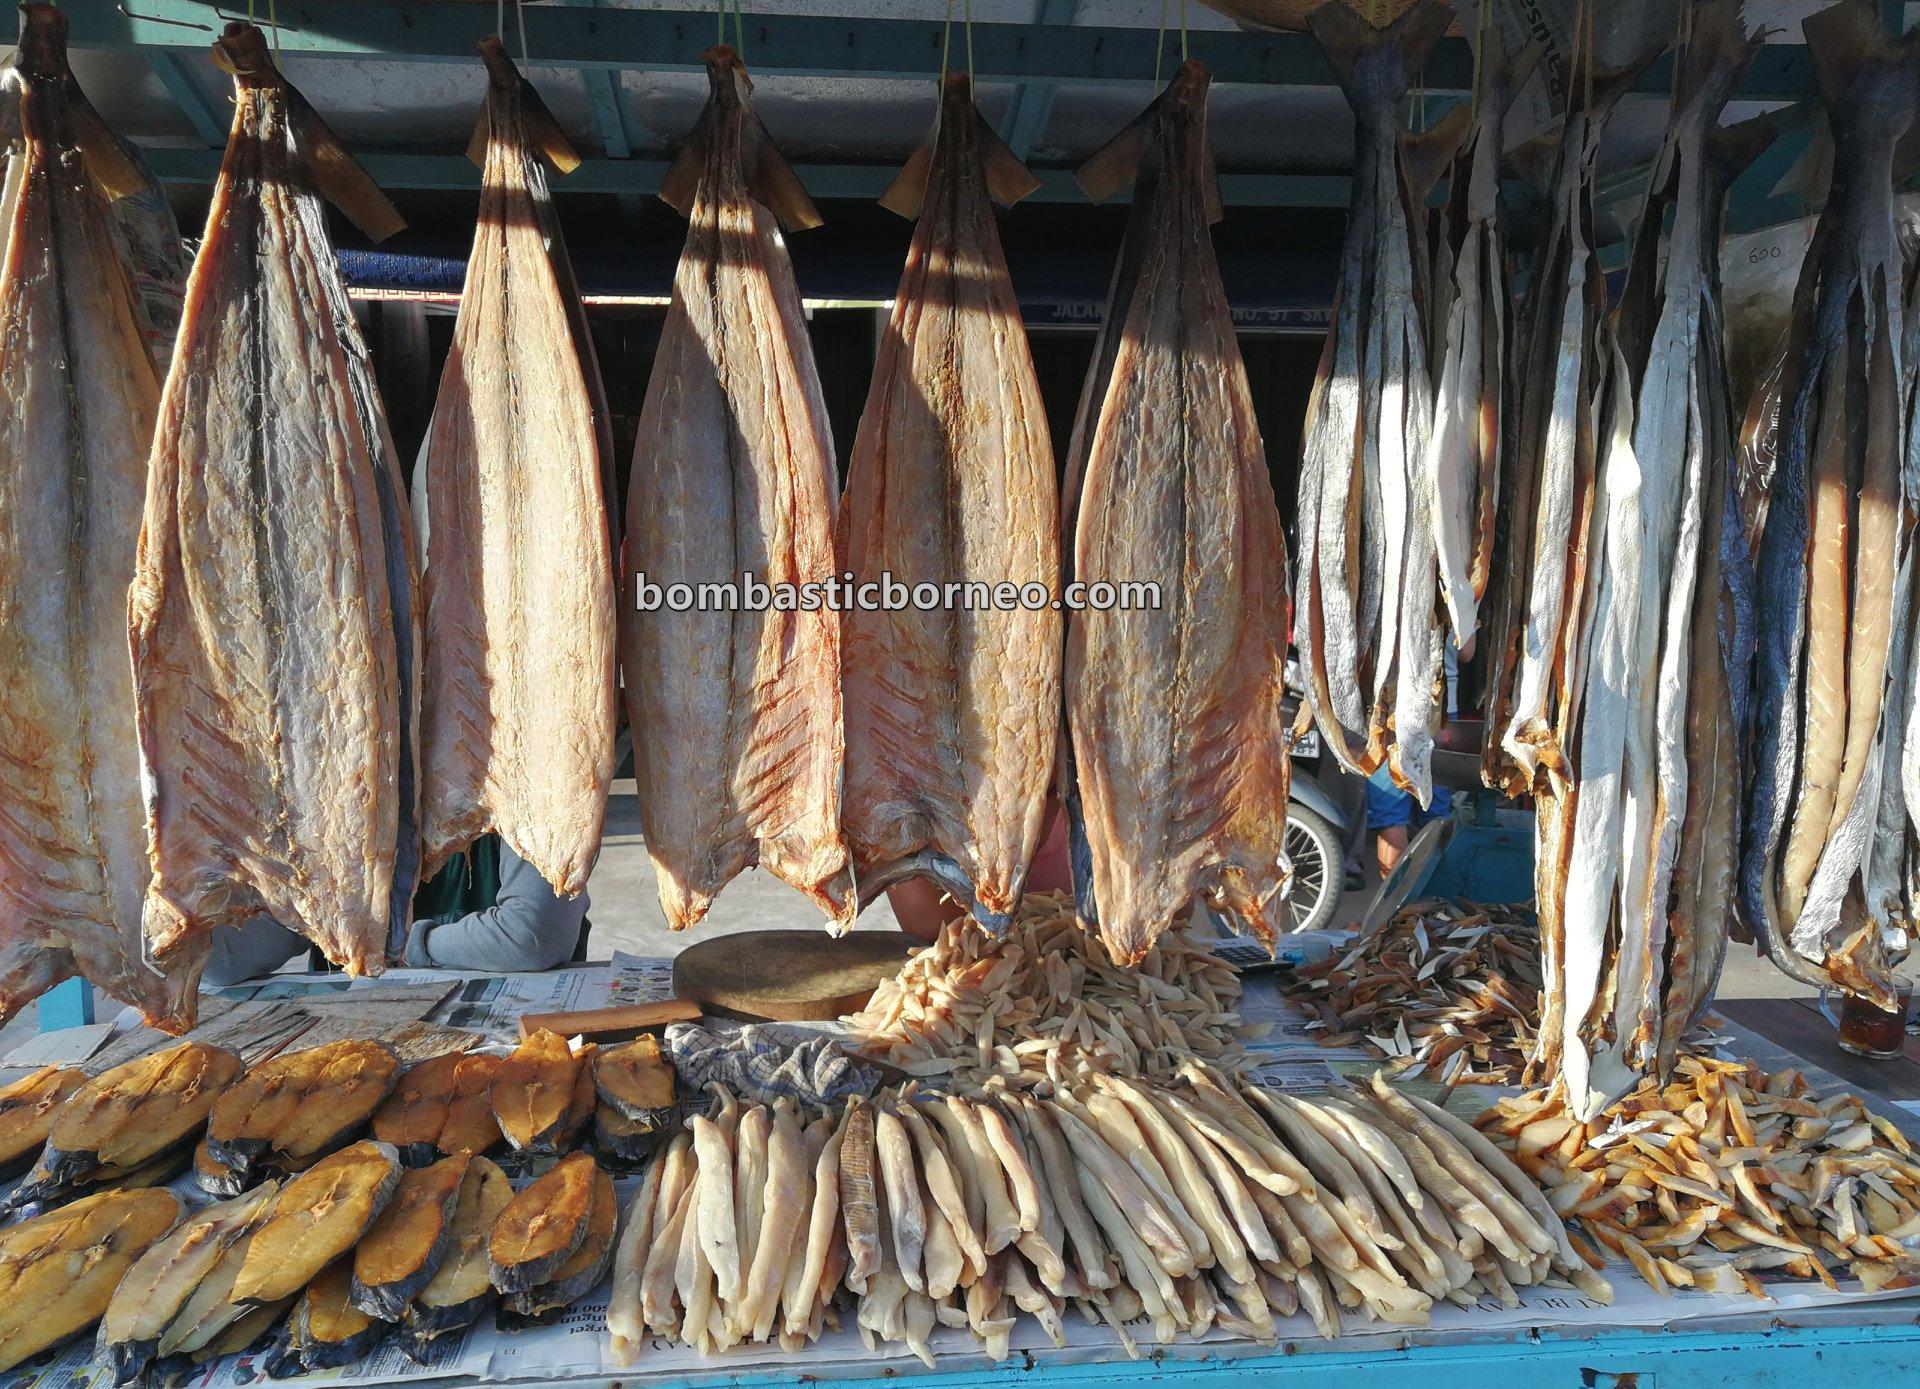 Pasar Turi, Morning Market, authentic, tradisional, destination, Indonesia, Kalimantan Barat, Kota Singkawang, seafood, salted fish, ikan asin, Obyek wisata, Tourism, travel guide, Borneo, makanan laut